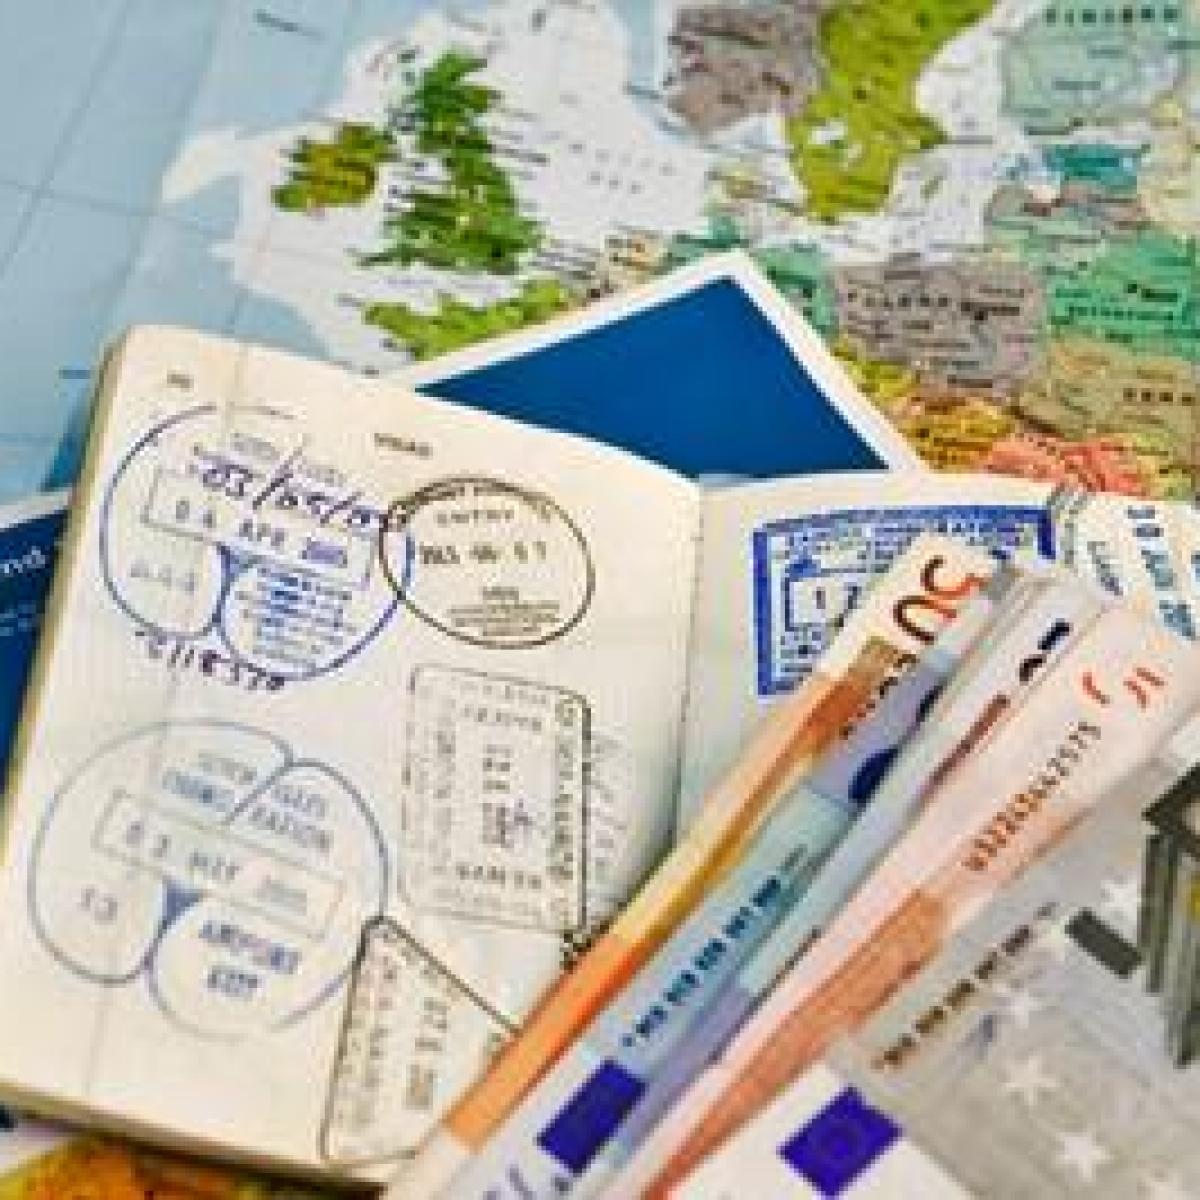 China mulls not recognizing British National Overseas passports as travel documents